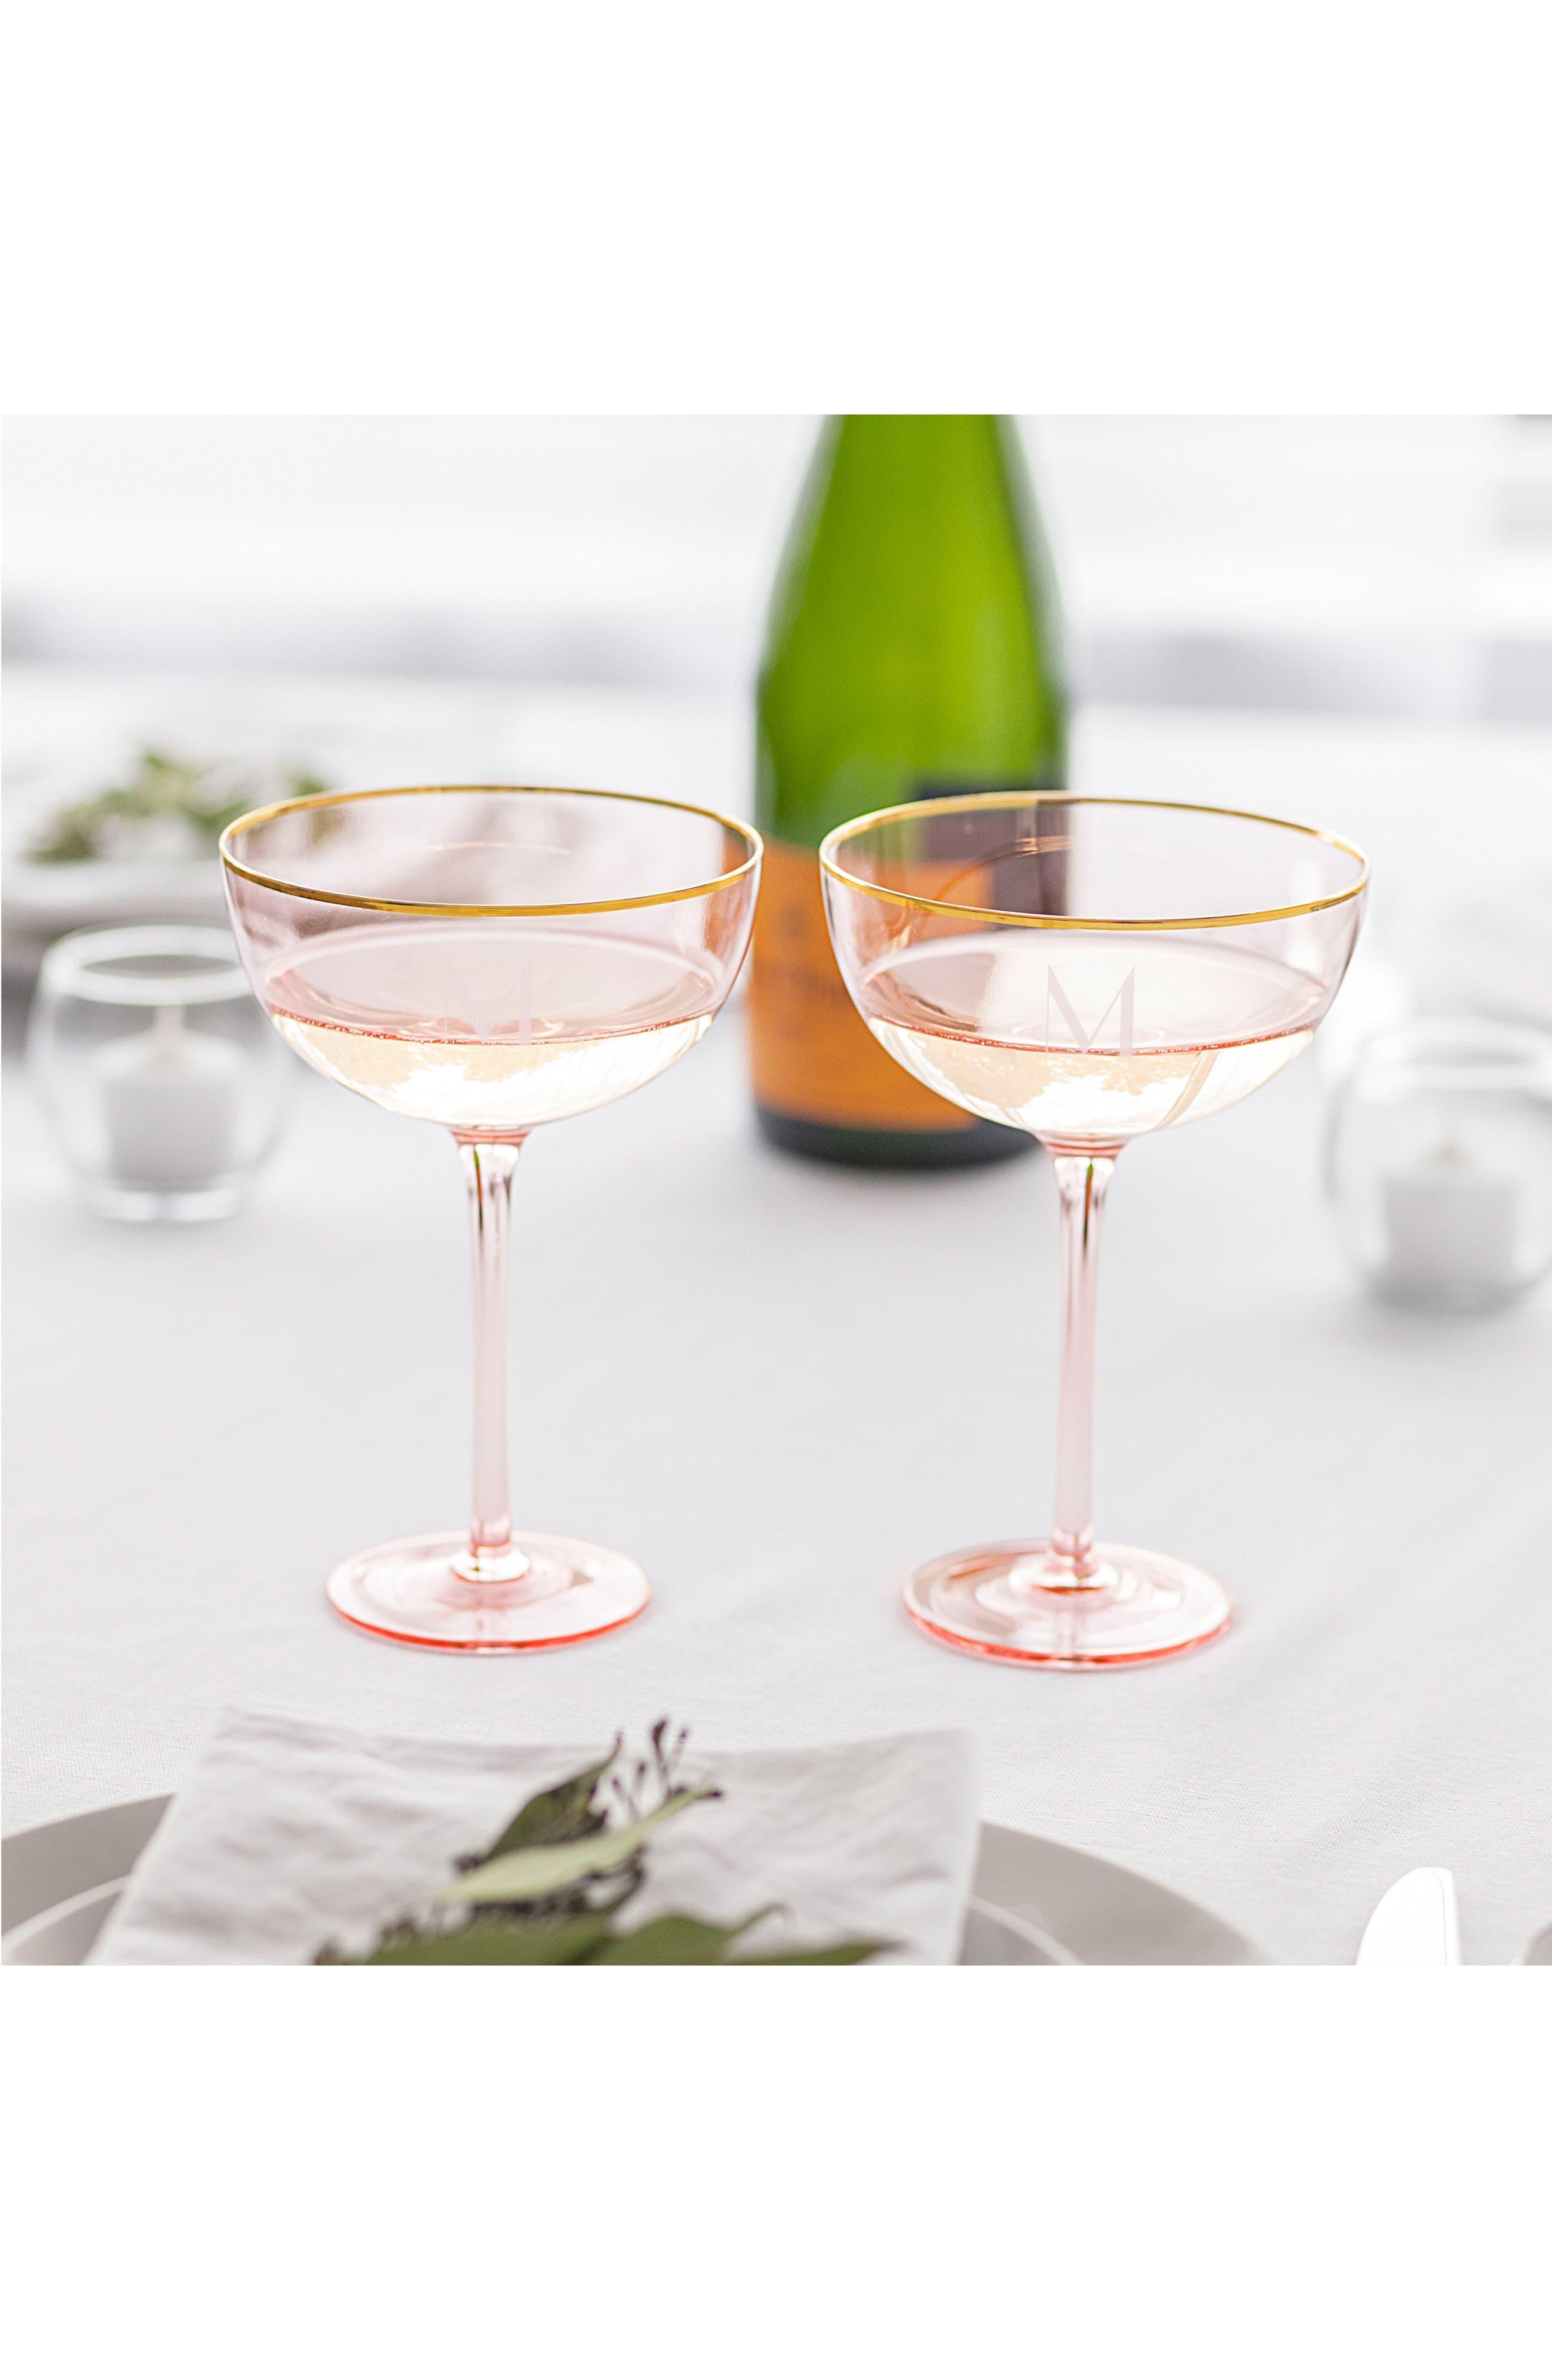 Monogram Set of 2 Champagne Coupes,                             Alternate thumbnail 4, color,                             220